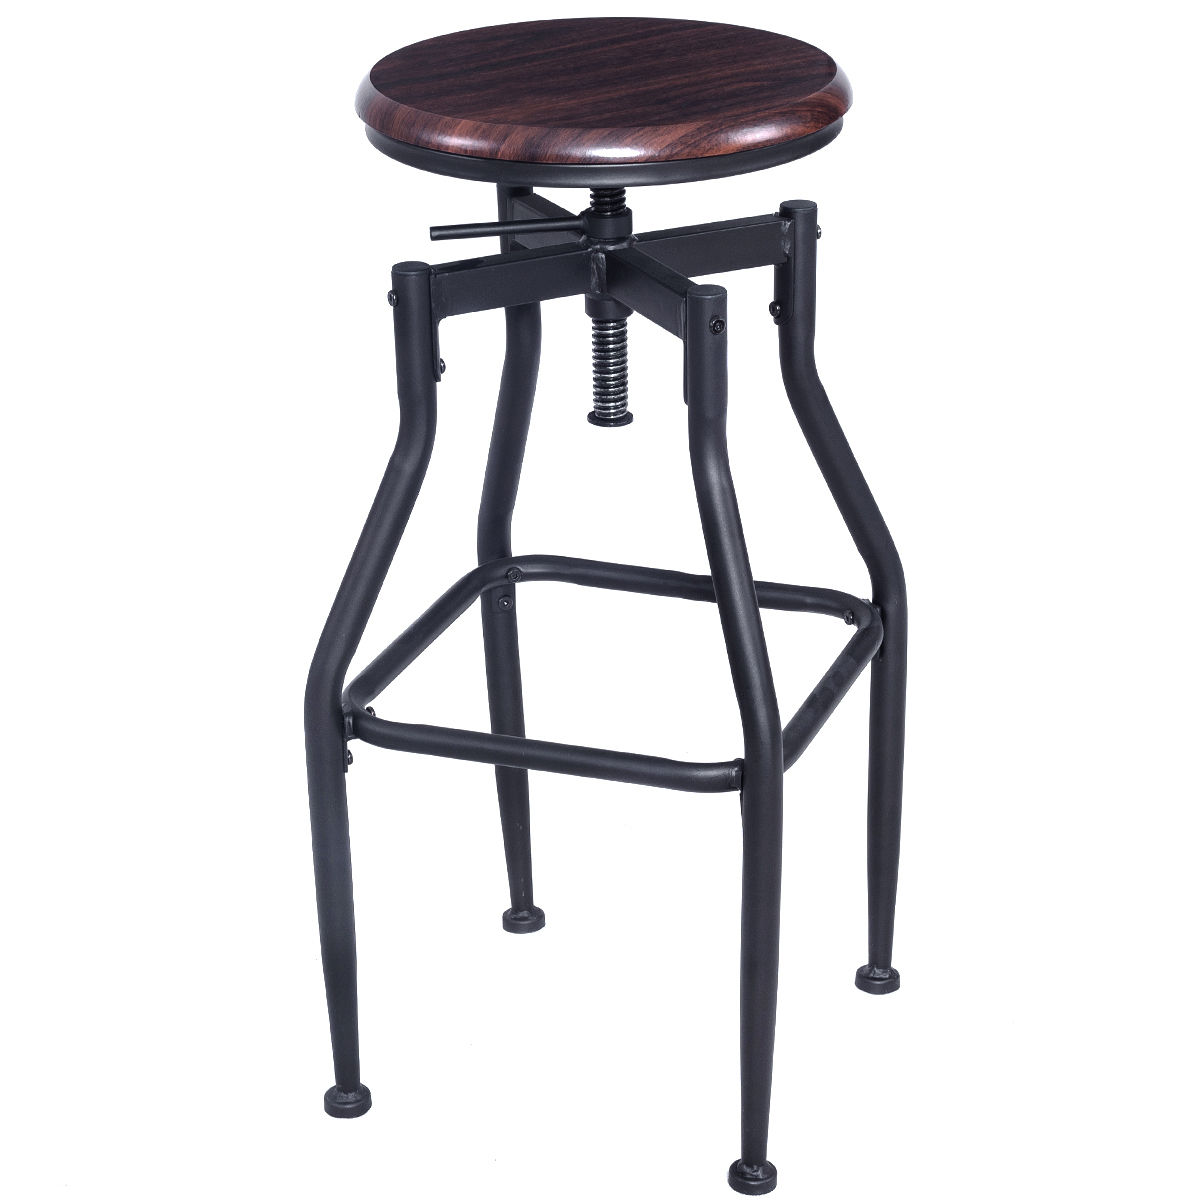 Stupendous Top 8 Most Popular Bar Stools Designer List And Get Free Beatyapartments Chair Design Images Beatyapartmentscom